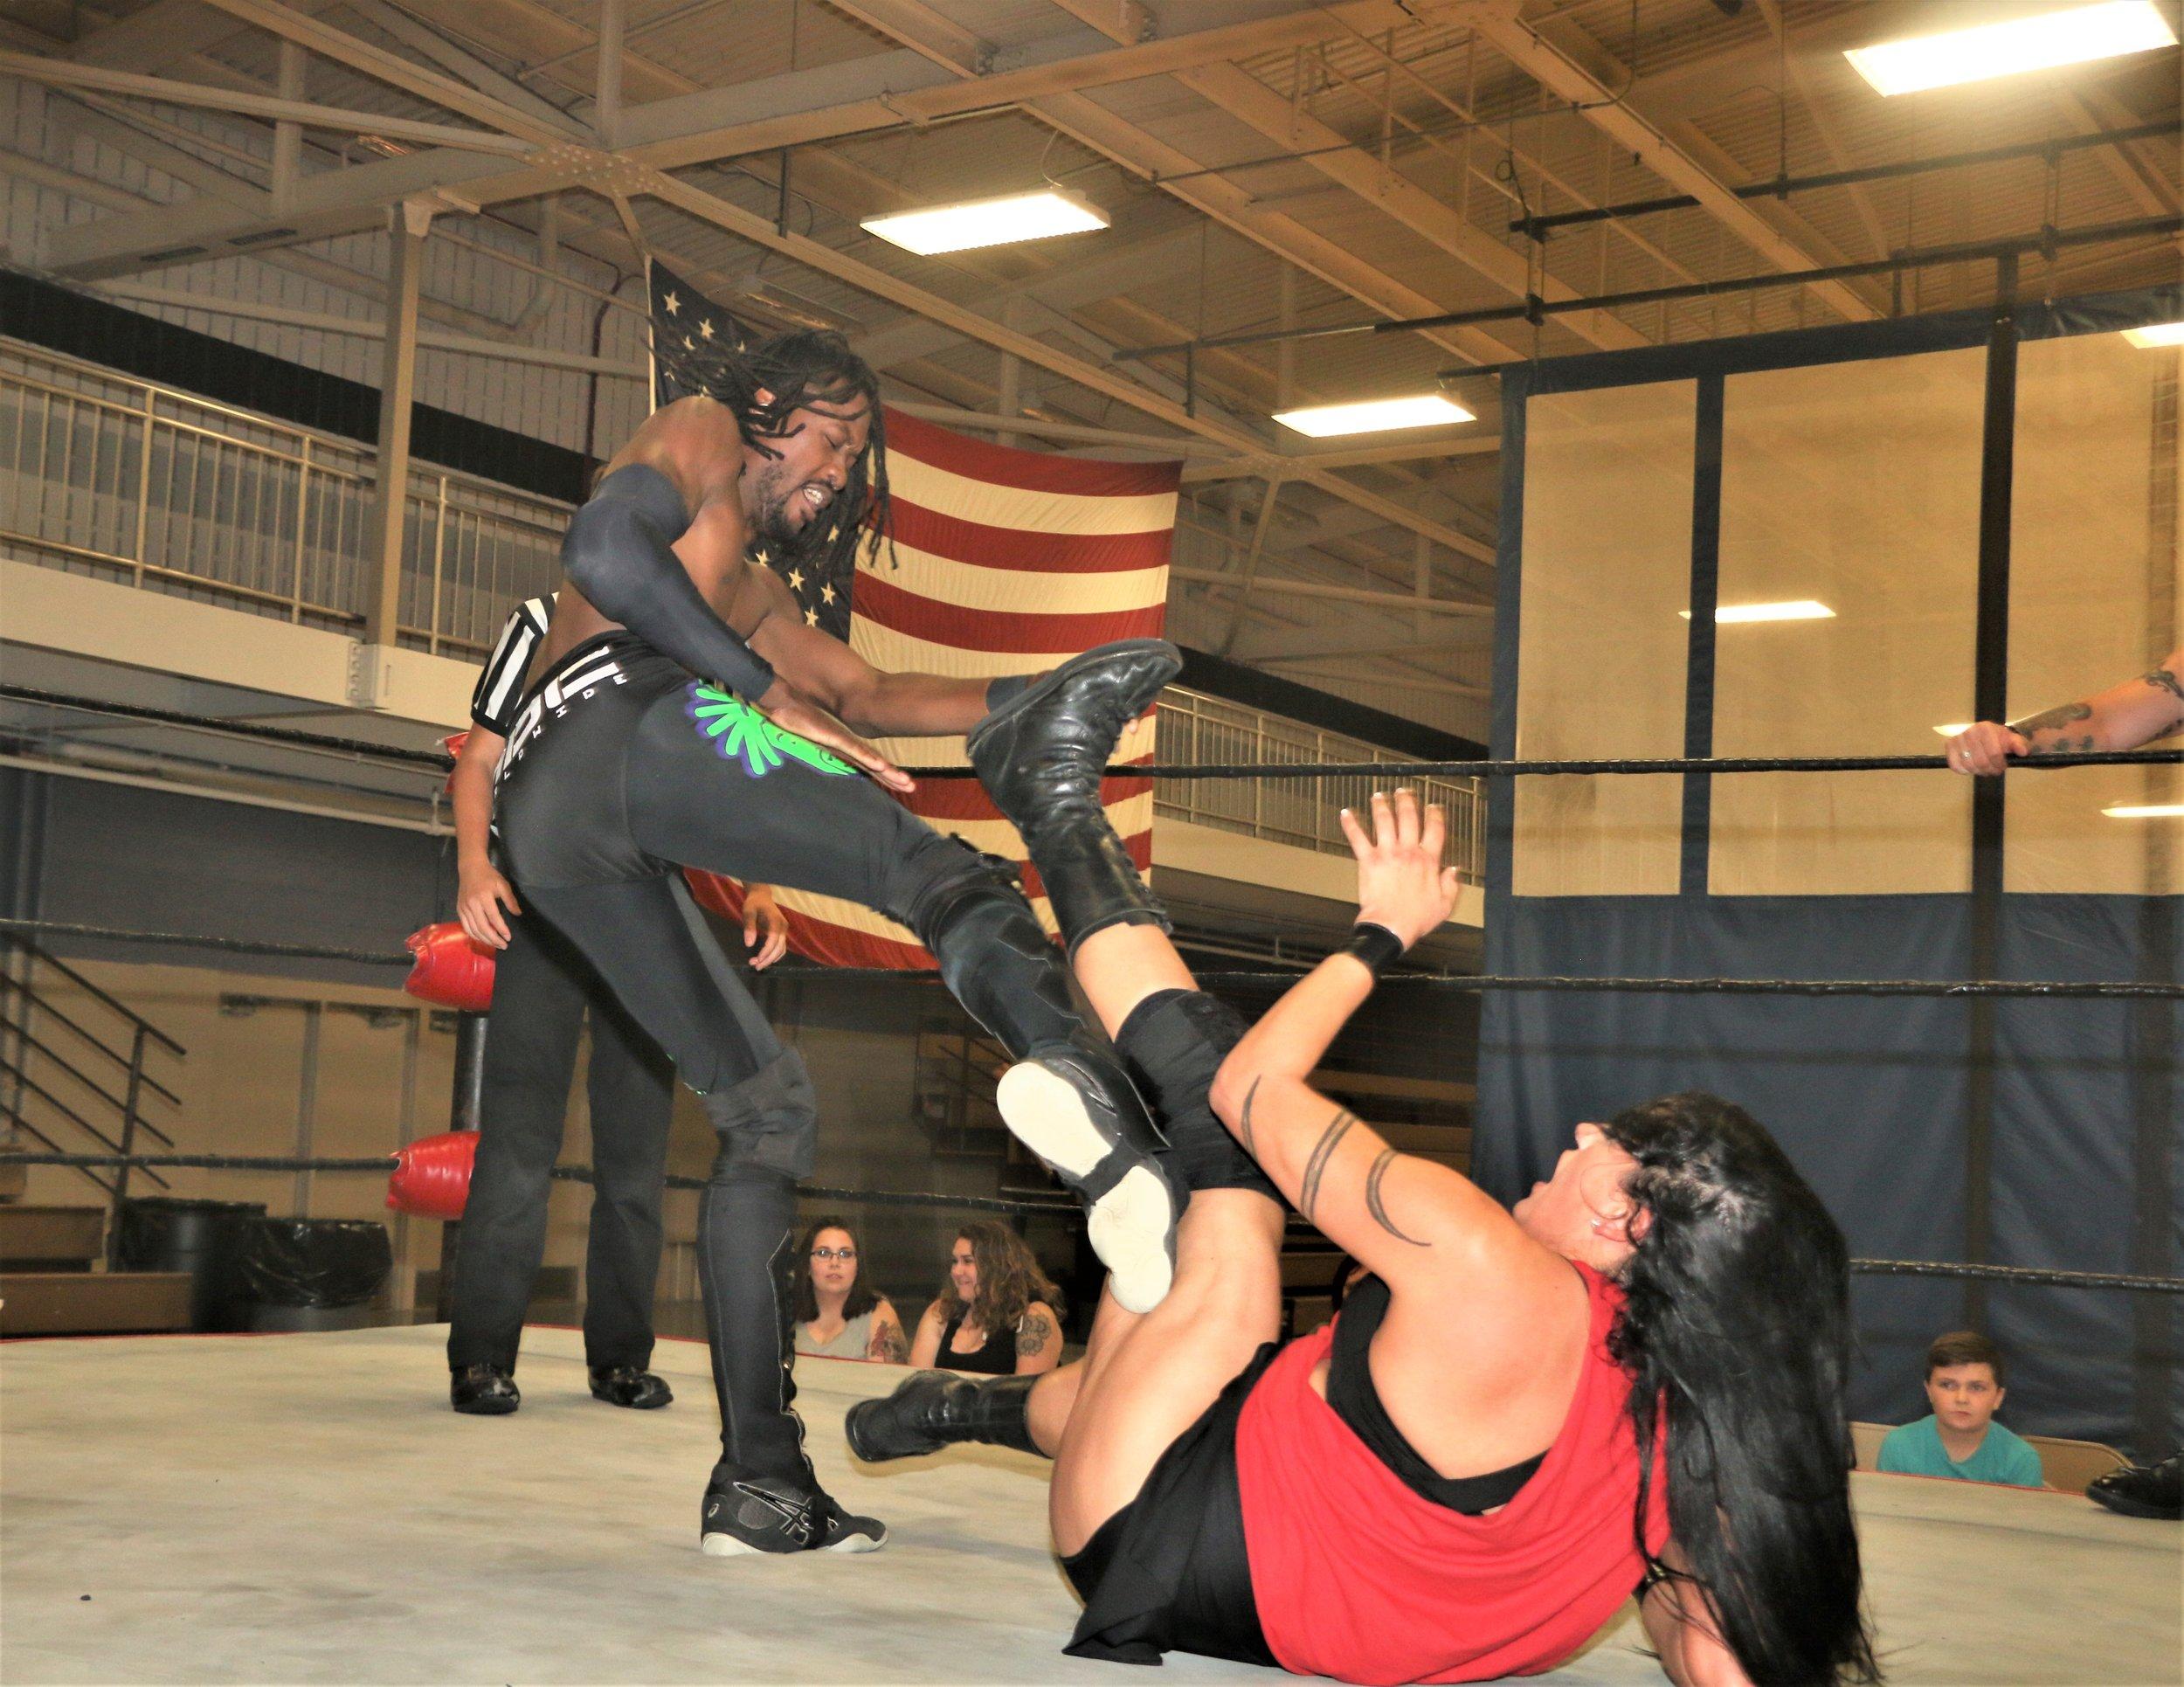 TW3 kicks the quad of Melanie Cruise.